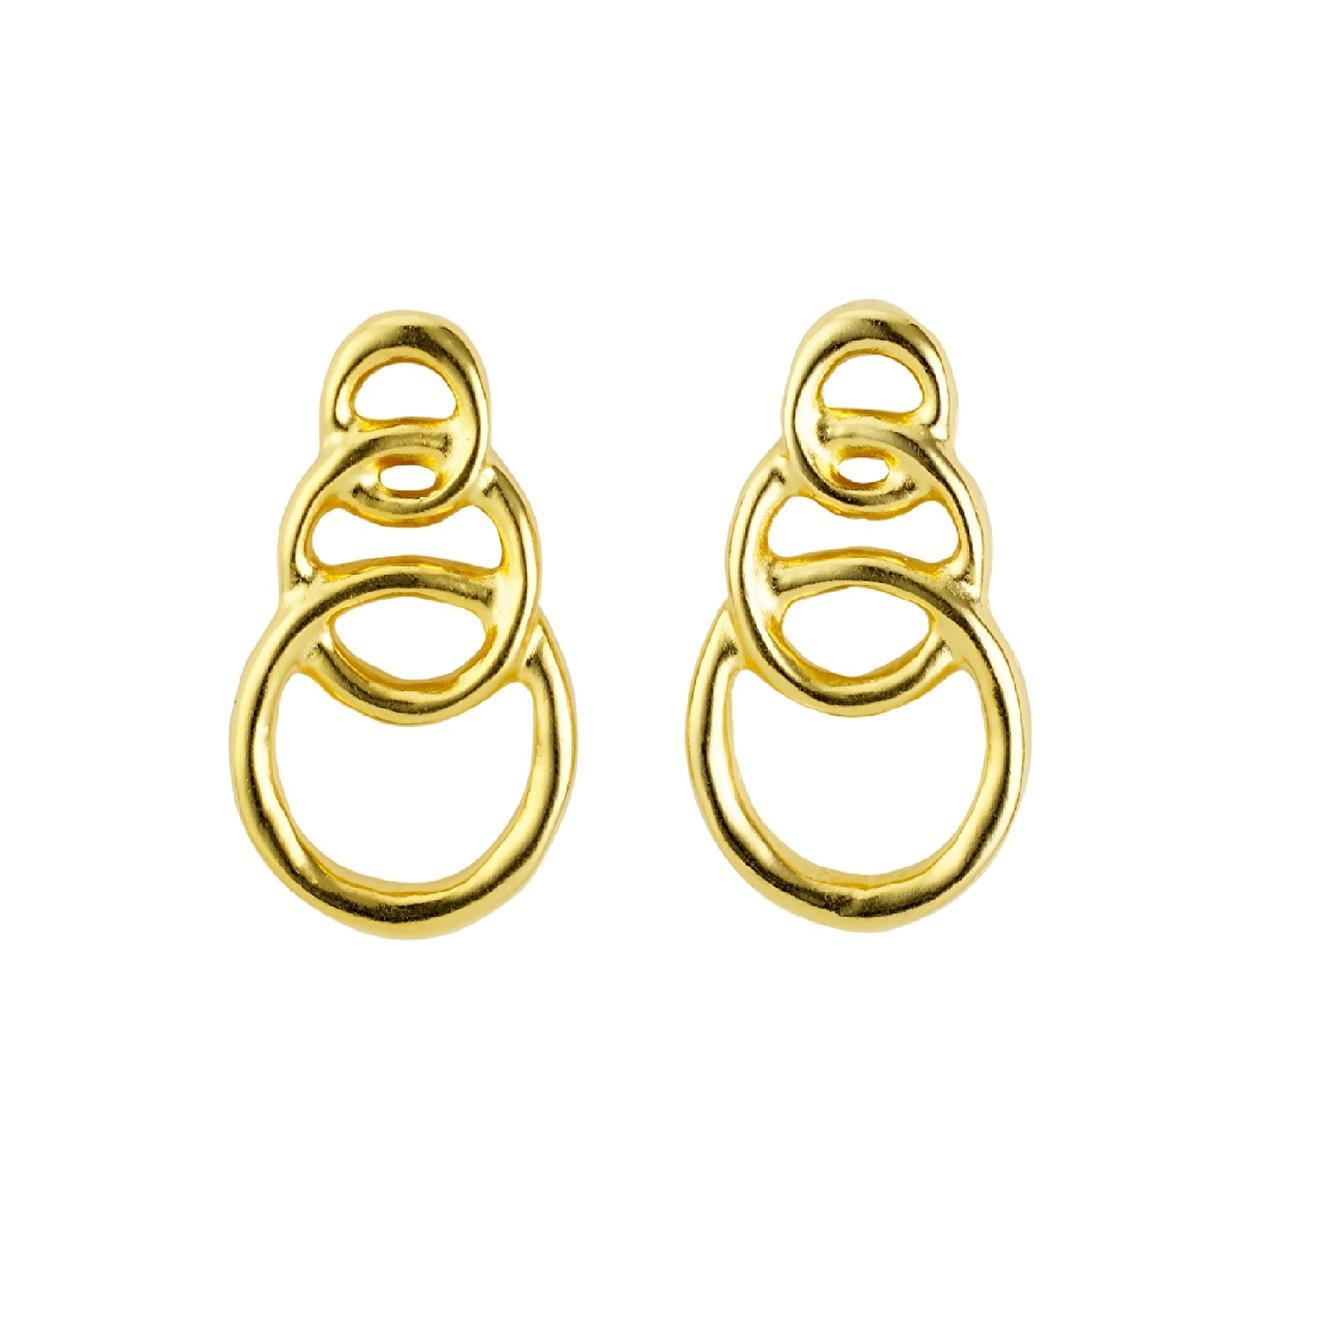 Unode50 Позолоченные серьги Chain by chain, из коллекции Gold